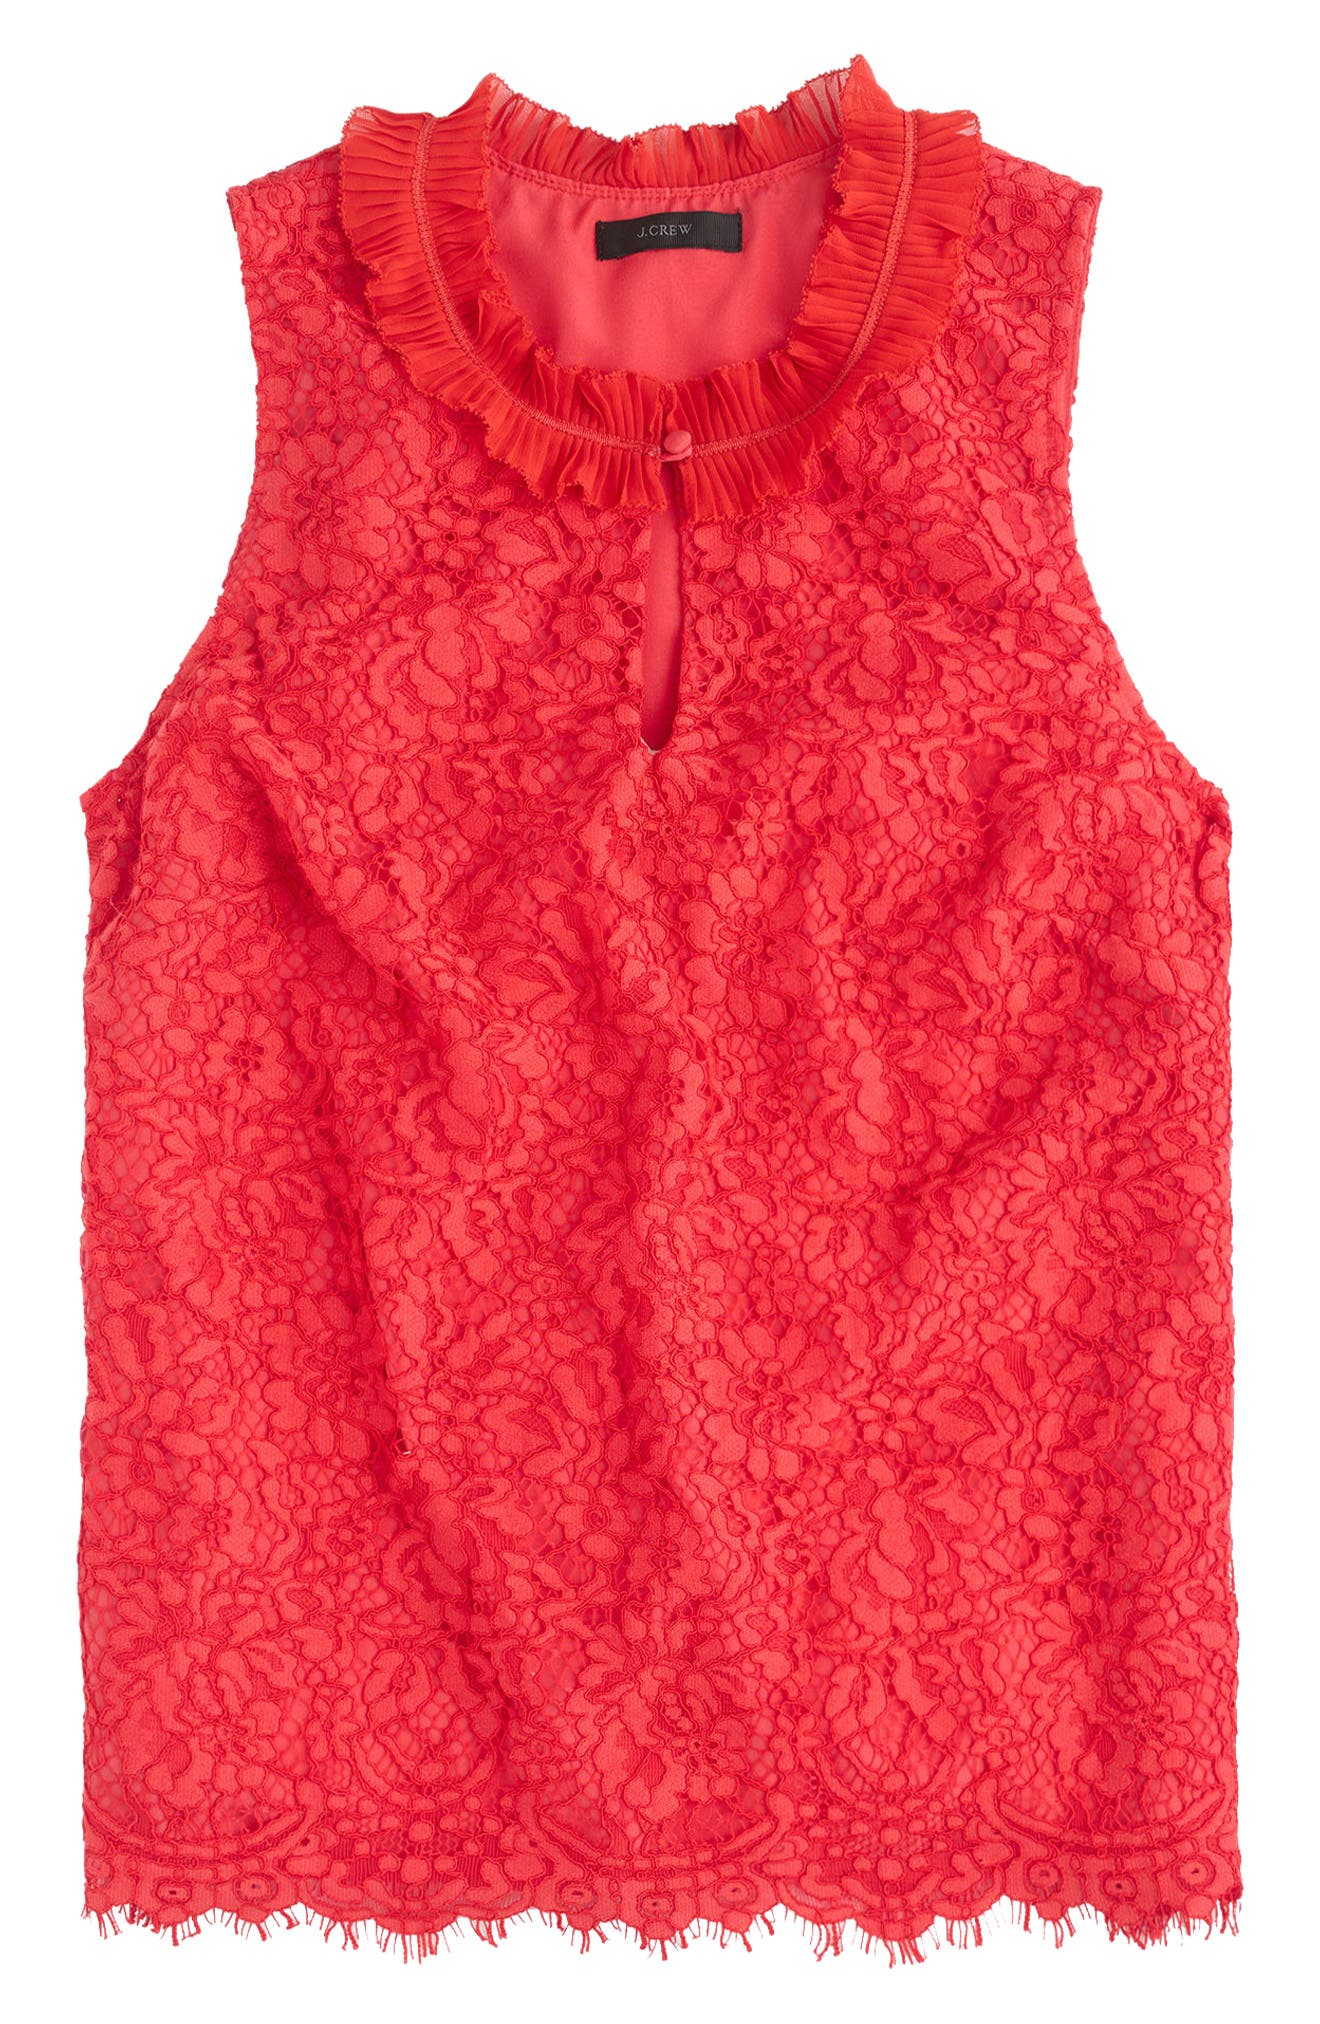 Lace Ruffle Neck Top,                             Main thumbnail 1, color,                             Bright Cerise